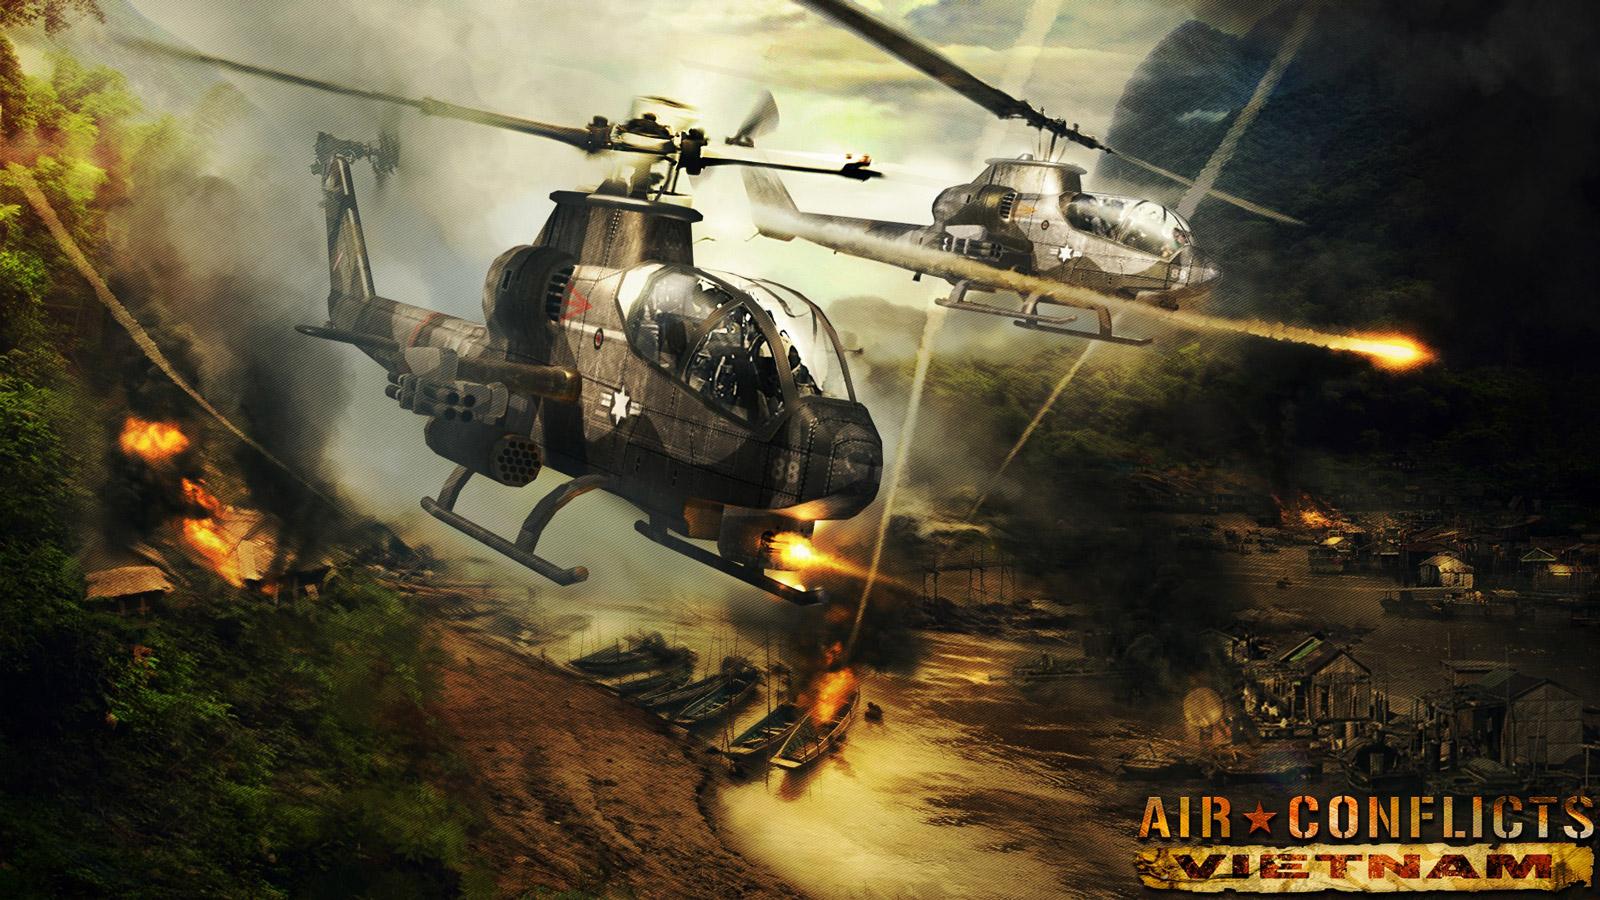 Air Conflicts: Vietnam Wallpaper in 1600x900